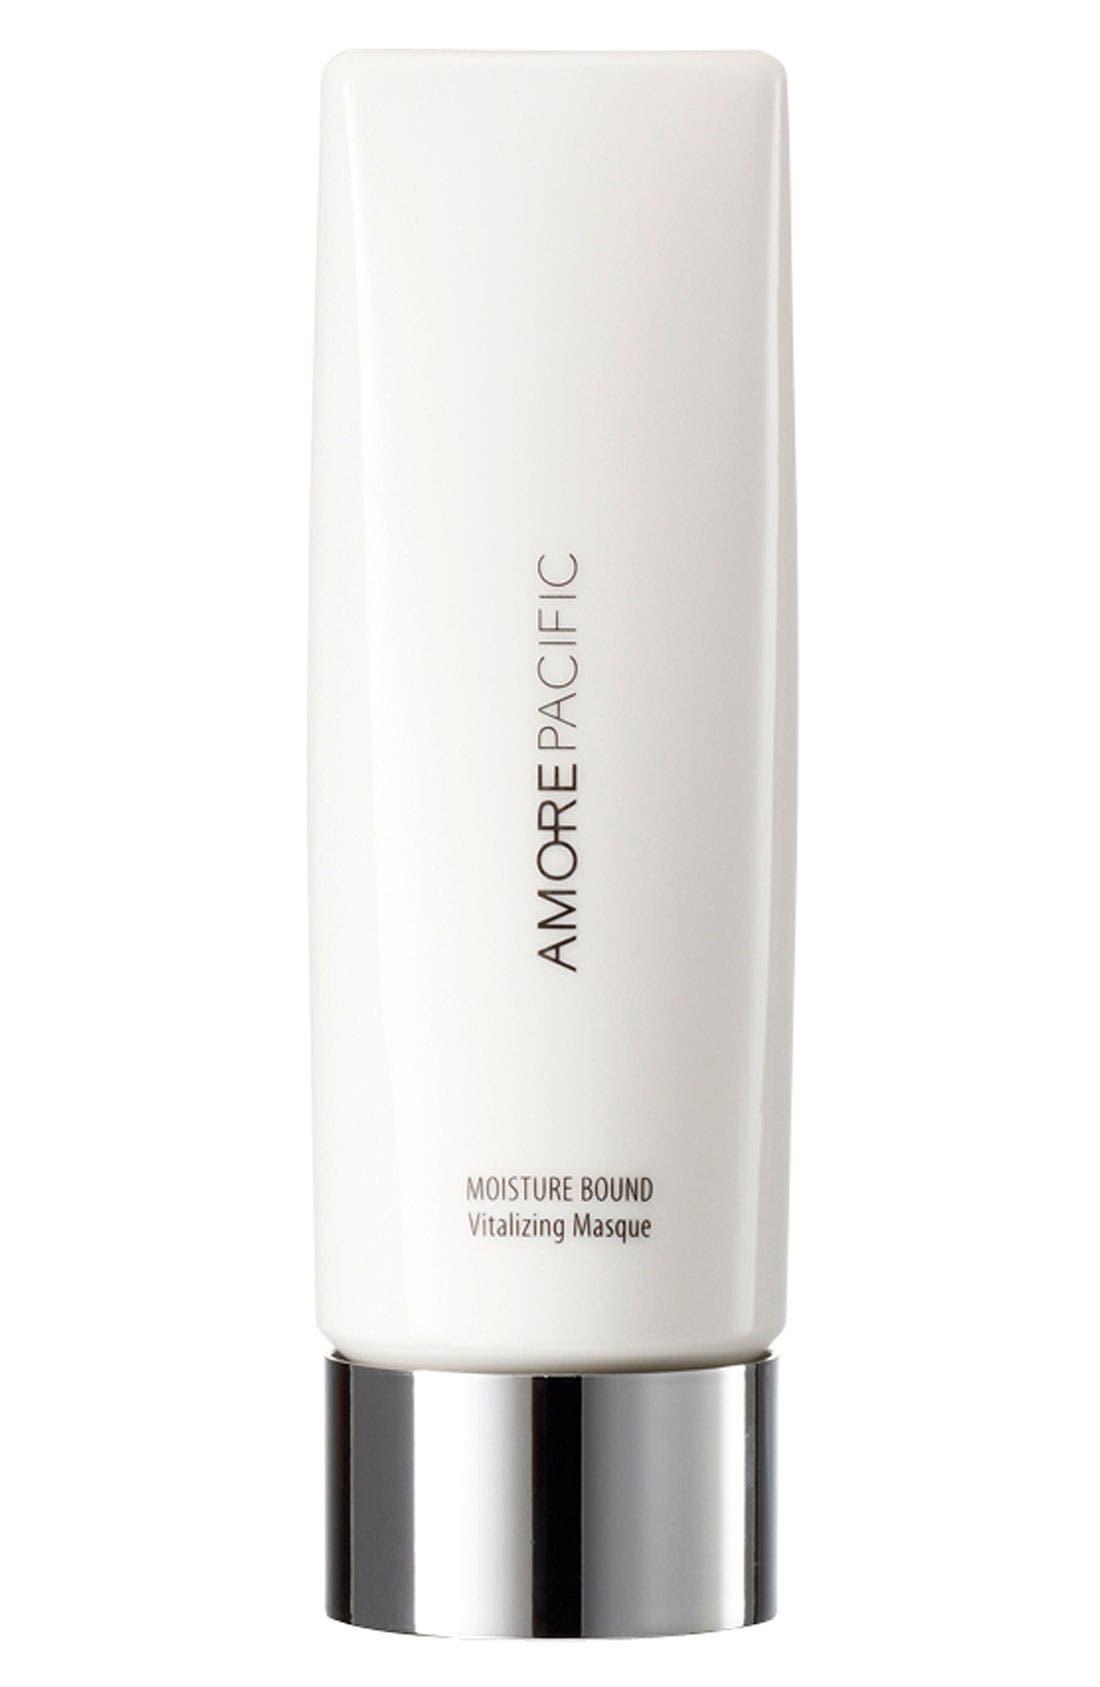 AMOREPACIFIC, 'Moisture Bound' Vitalizing Face Masque, Main thumbnail 1, color, 000